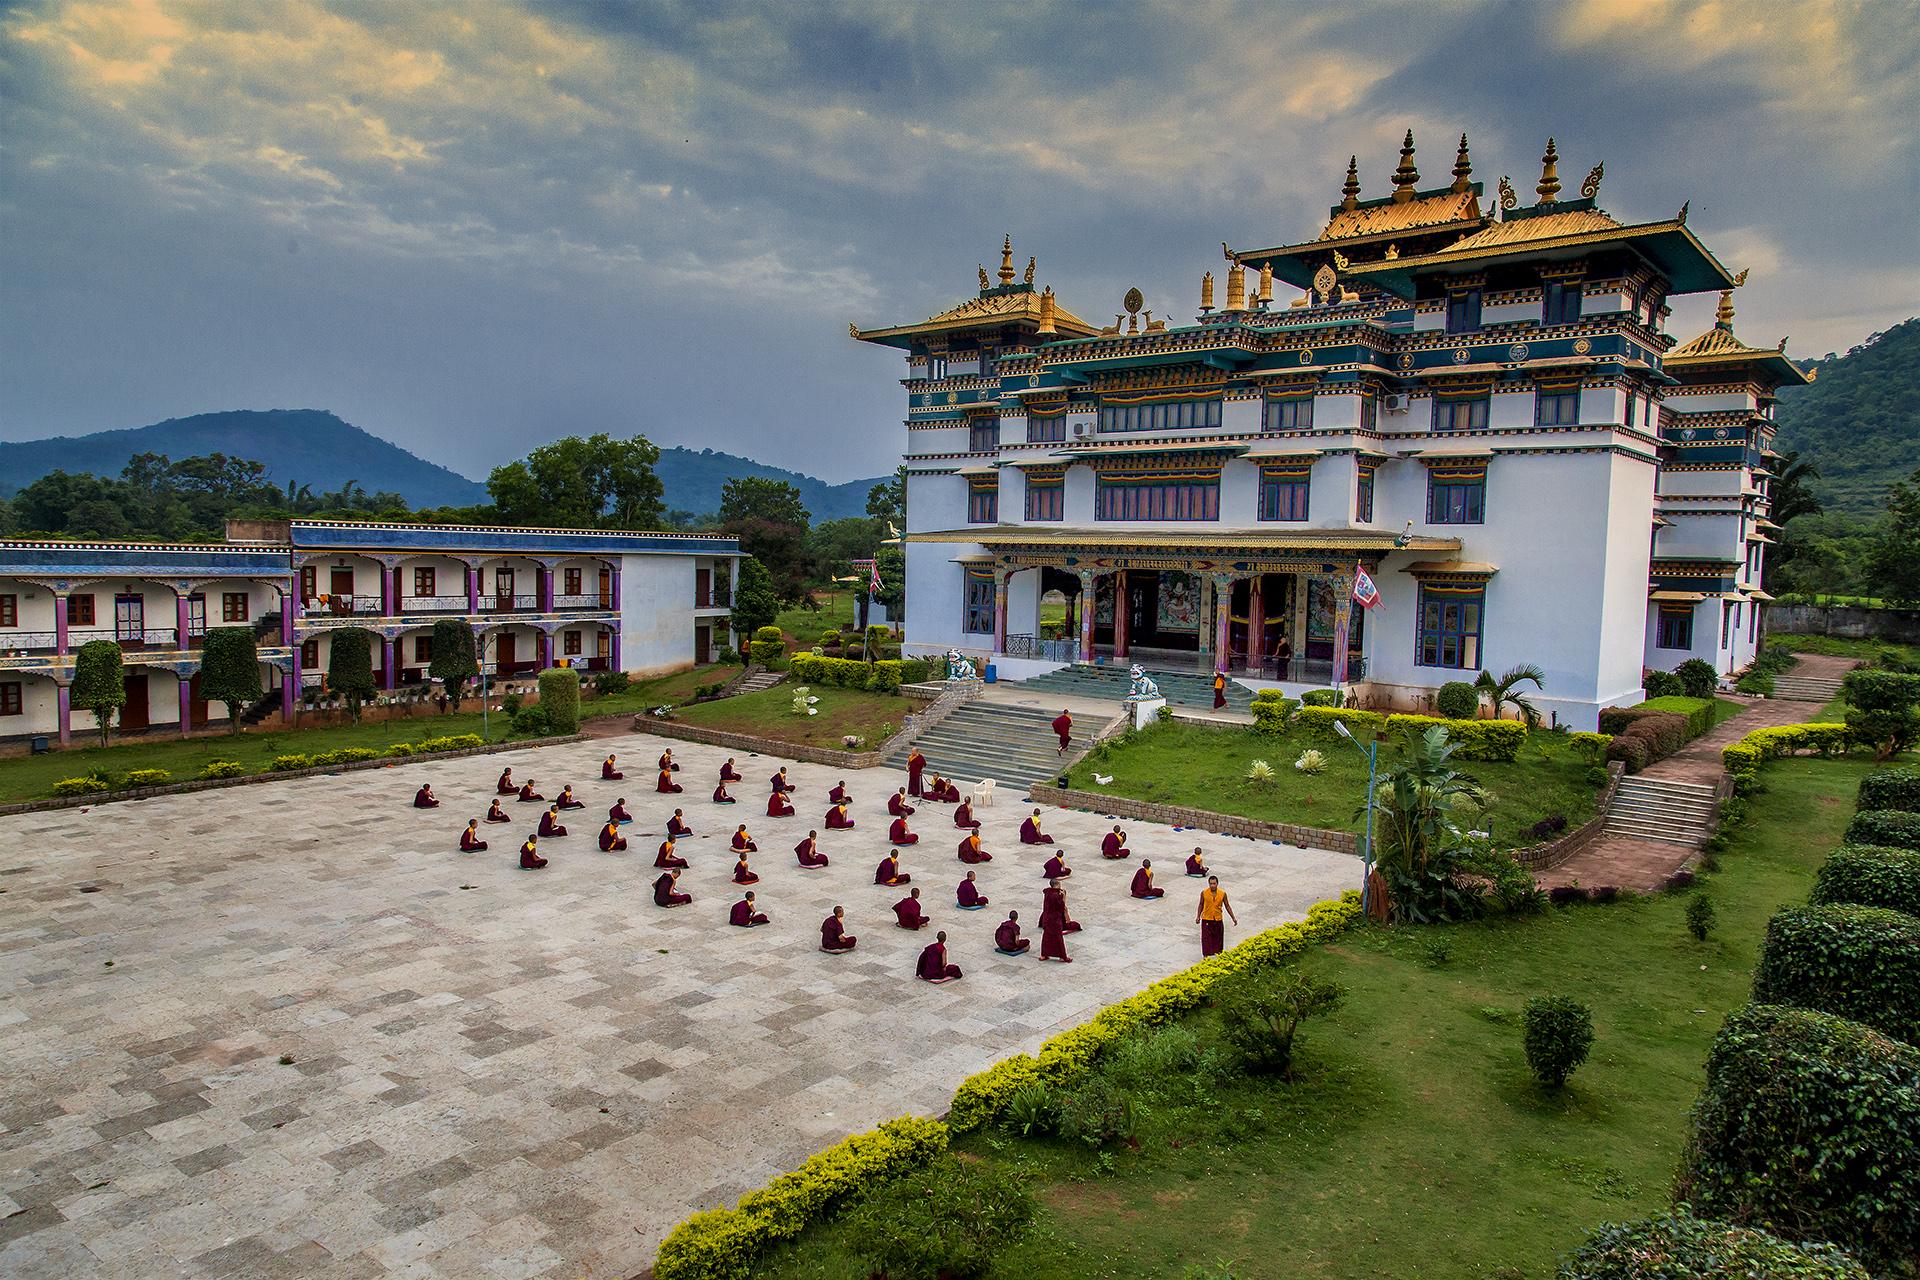 Jirang monanstry copy (1)